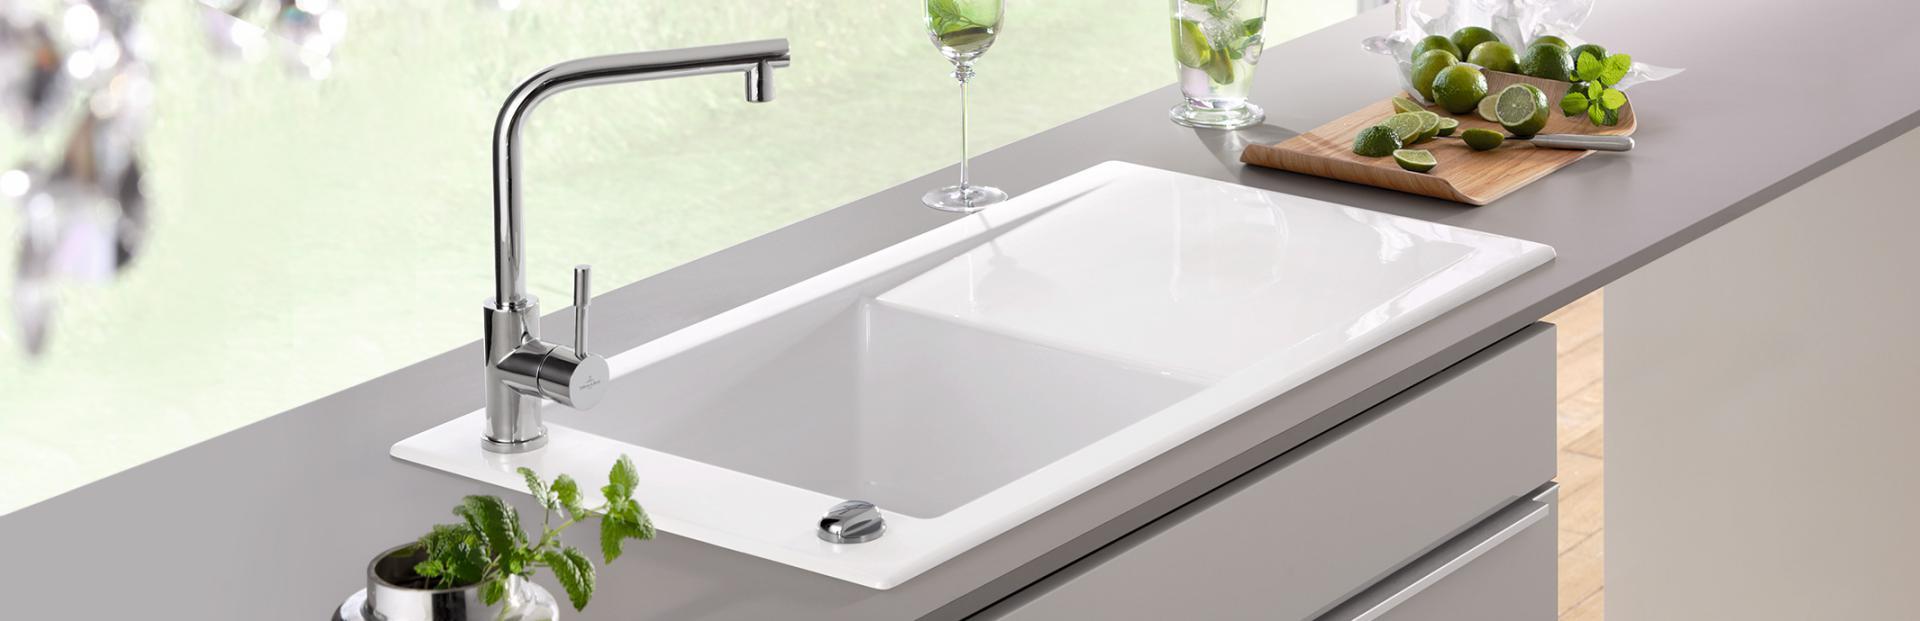 Oberflächen für starke Küchenspülen | REUTER Magazin | {Spülbecken keramik villeroy & boch 22}